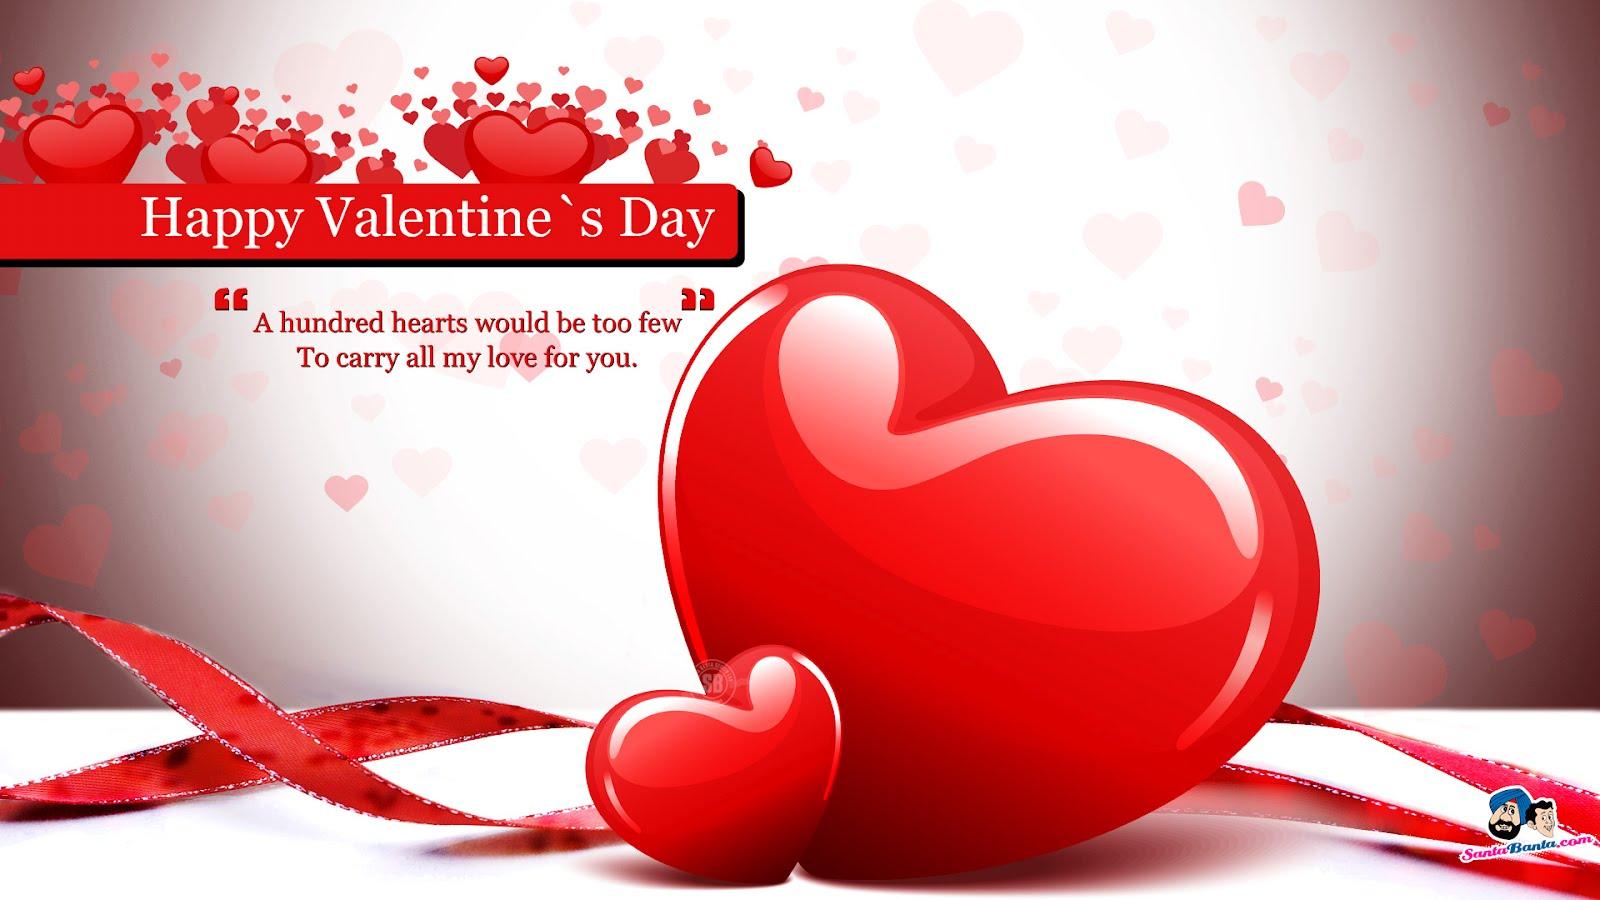 Free ecards happy valentine day happy valentine day hd ecards cards ecard greeting card wish your friends girlfriend wife girl m4hsunfo